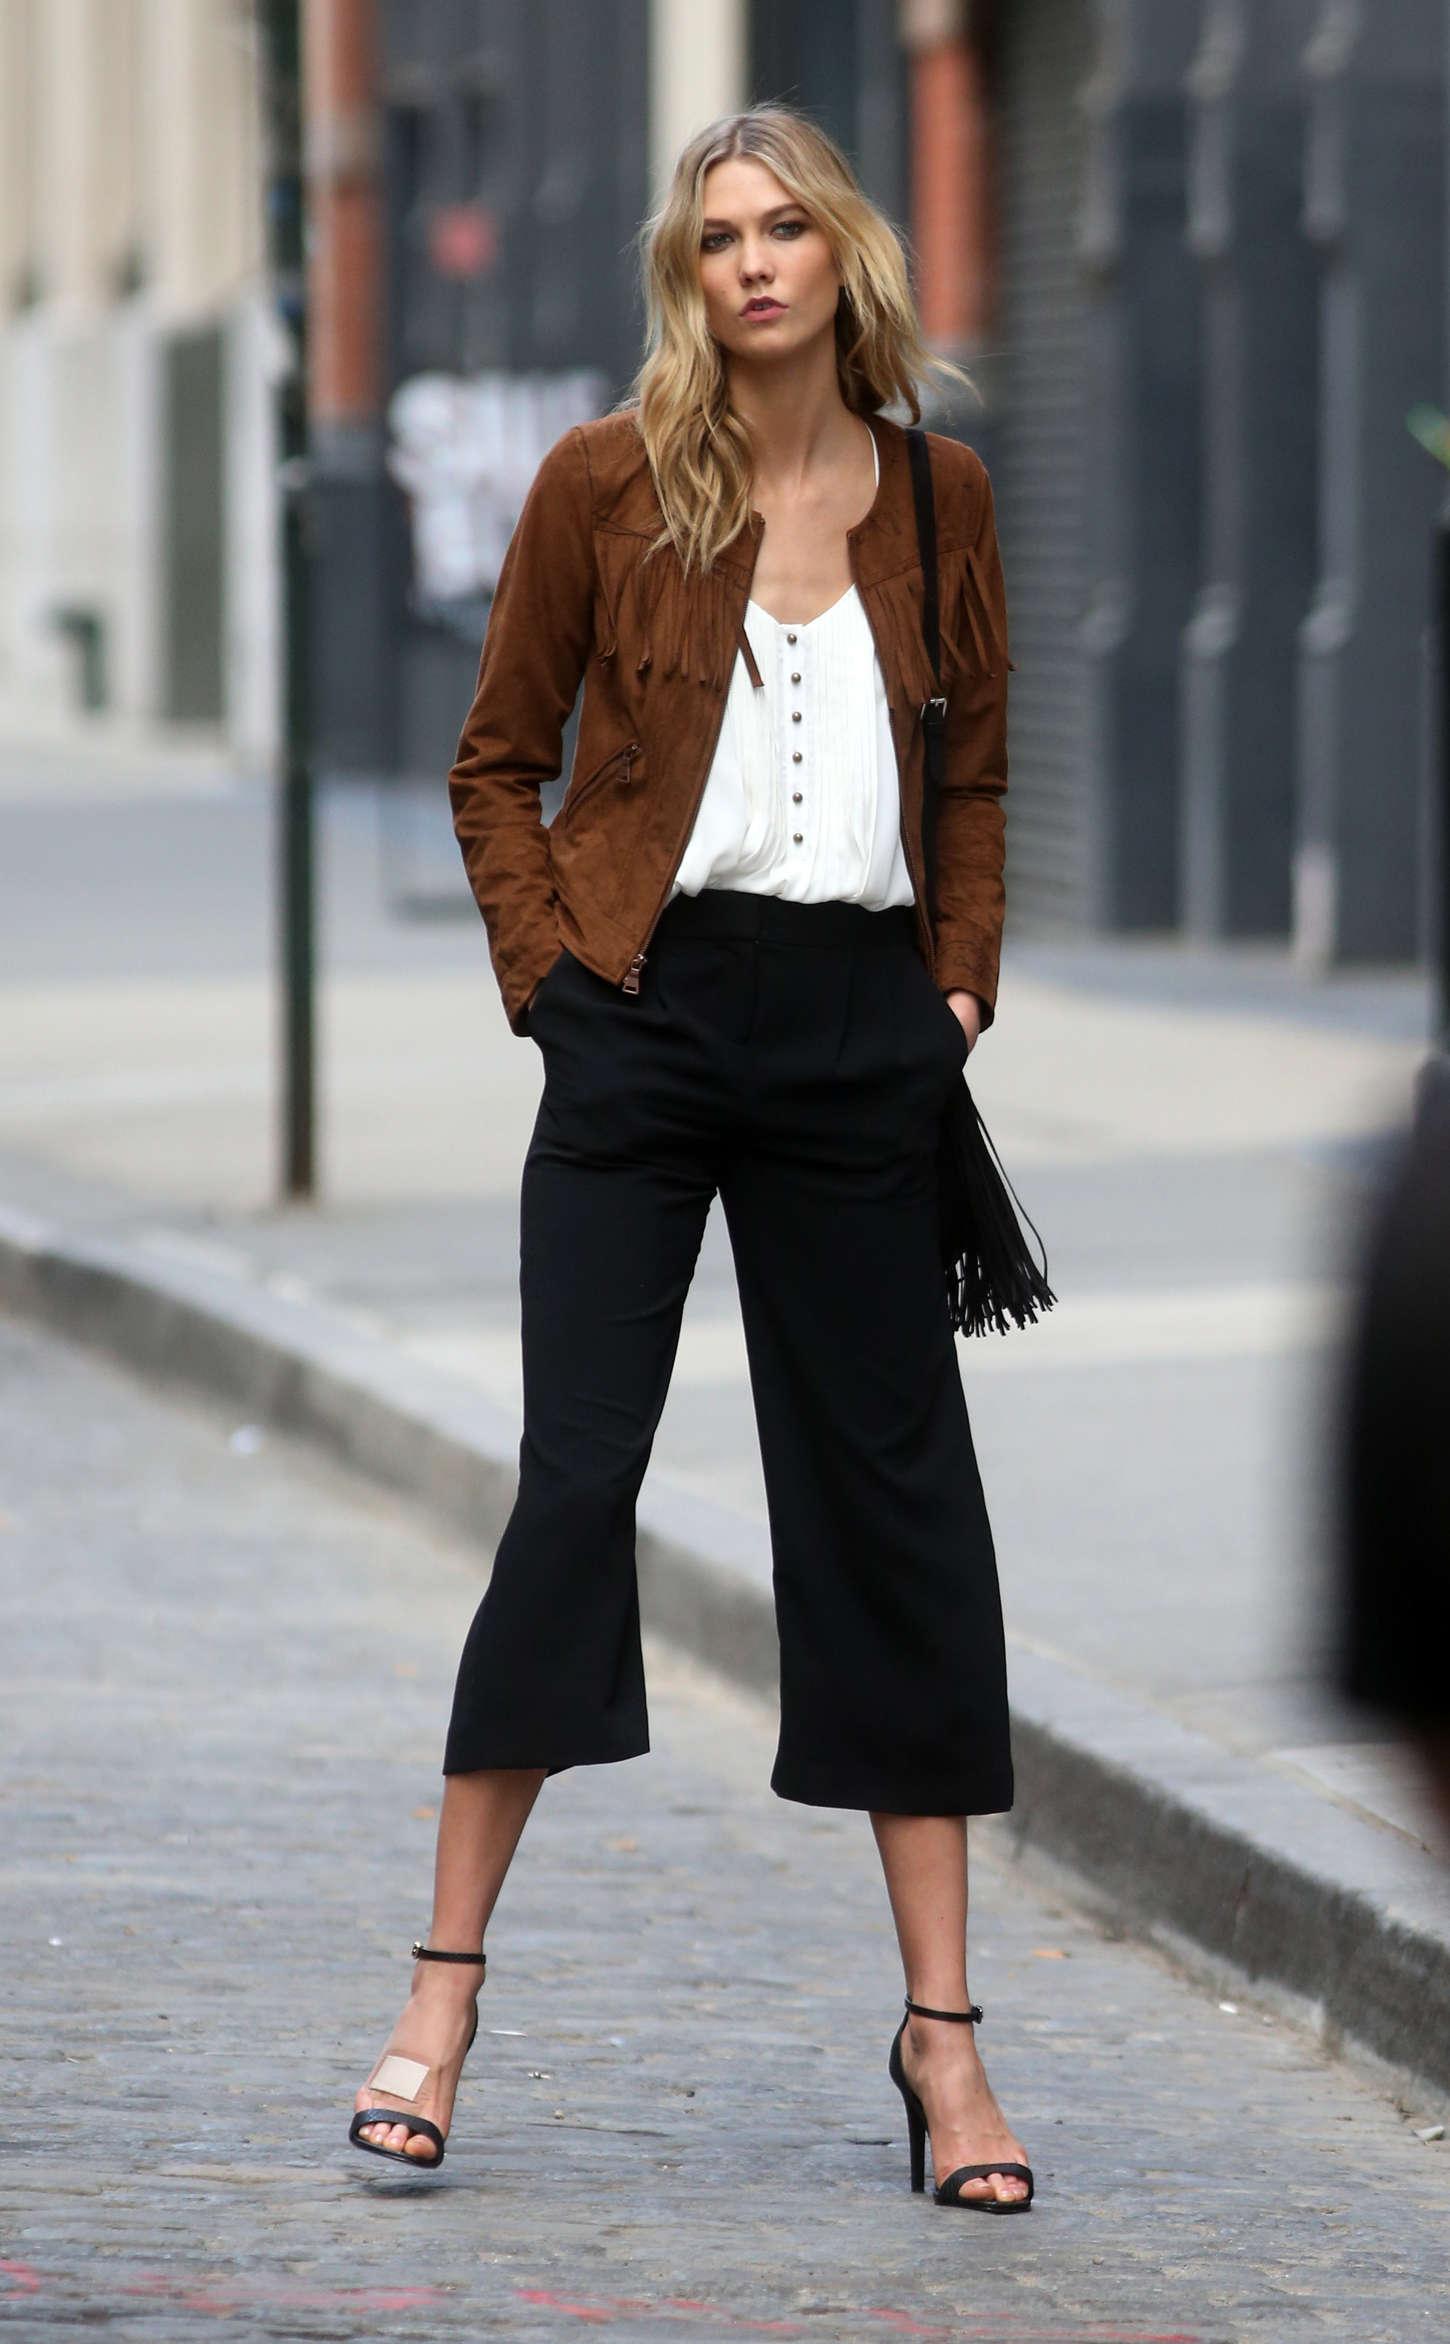 Karlie Kloss 2015 : Karlie Kloss: Photoshoot in NYC -58